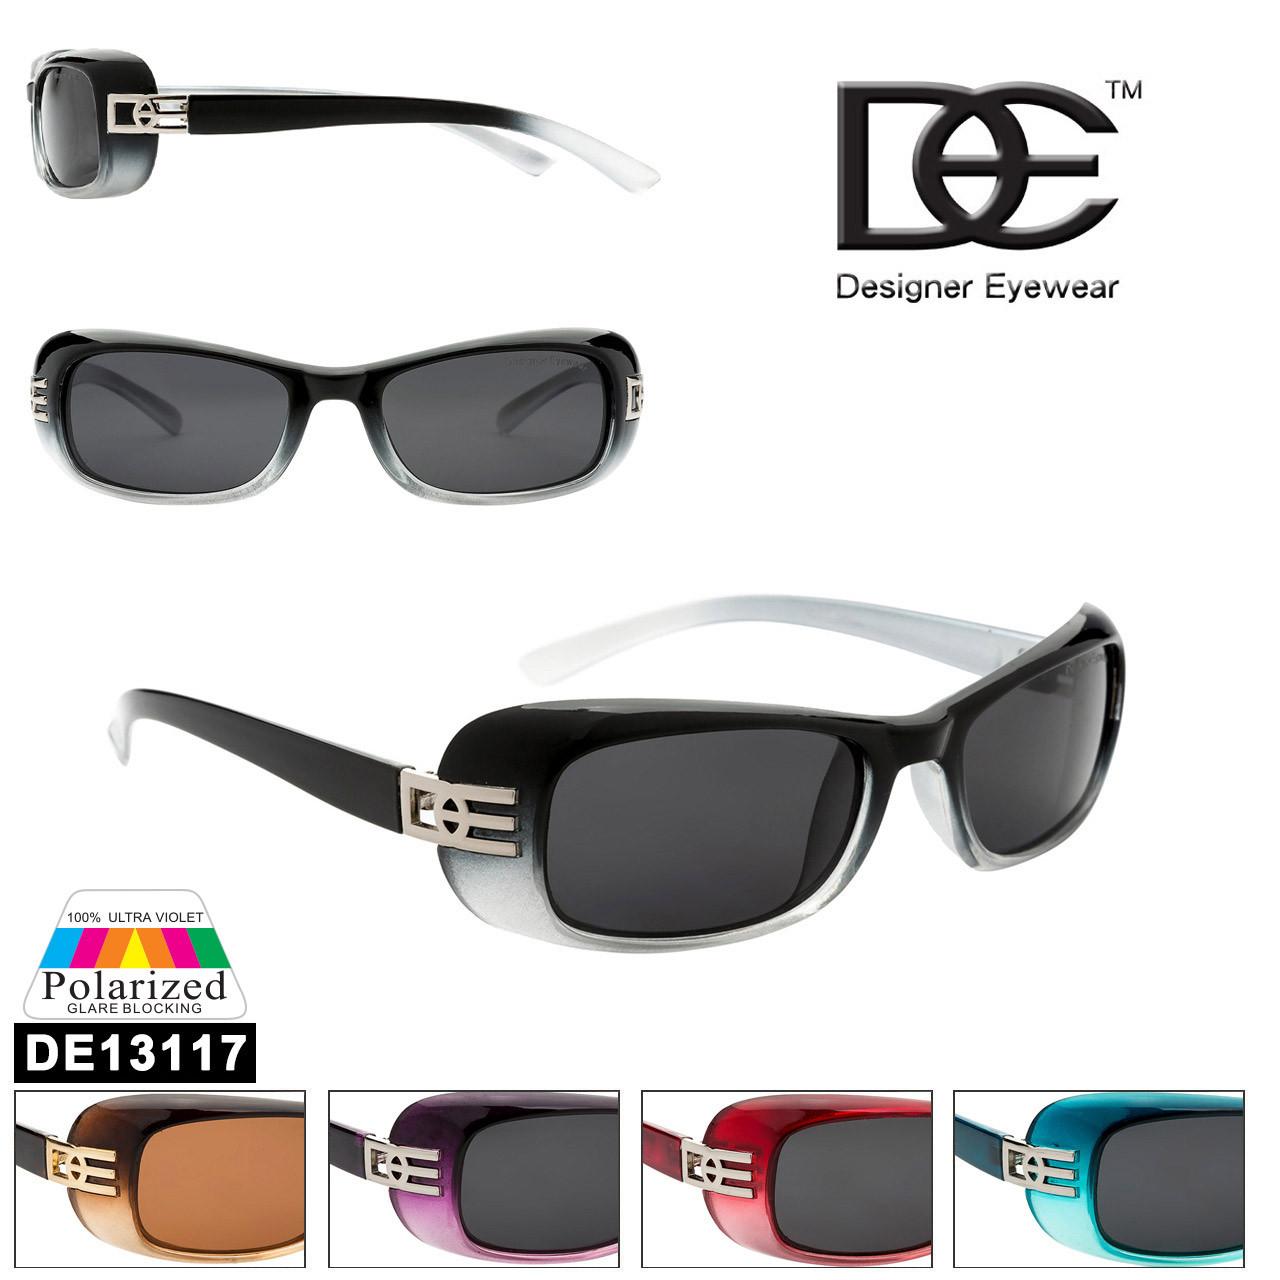 Women's Polarized Sunglasses by DE™ DE13117